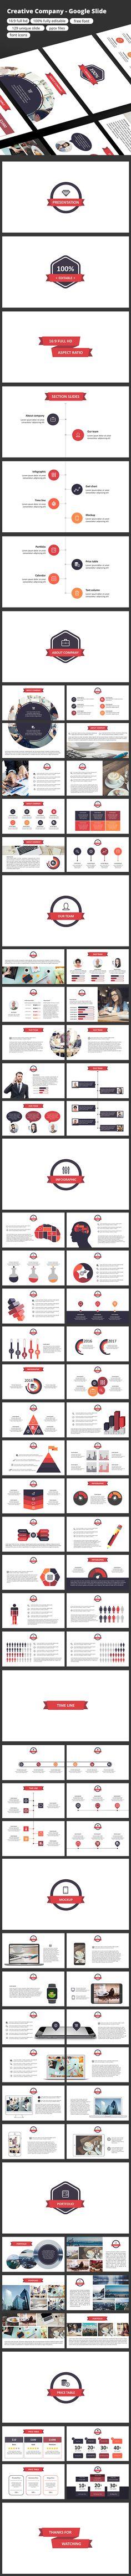 REES Business Google Slides | Presentation templates, Google and ...